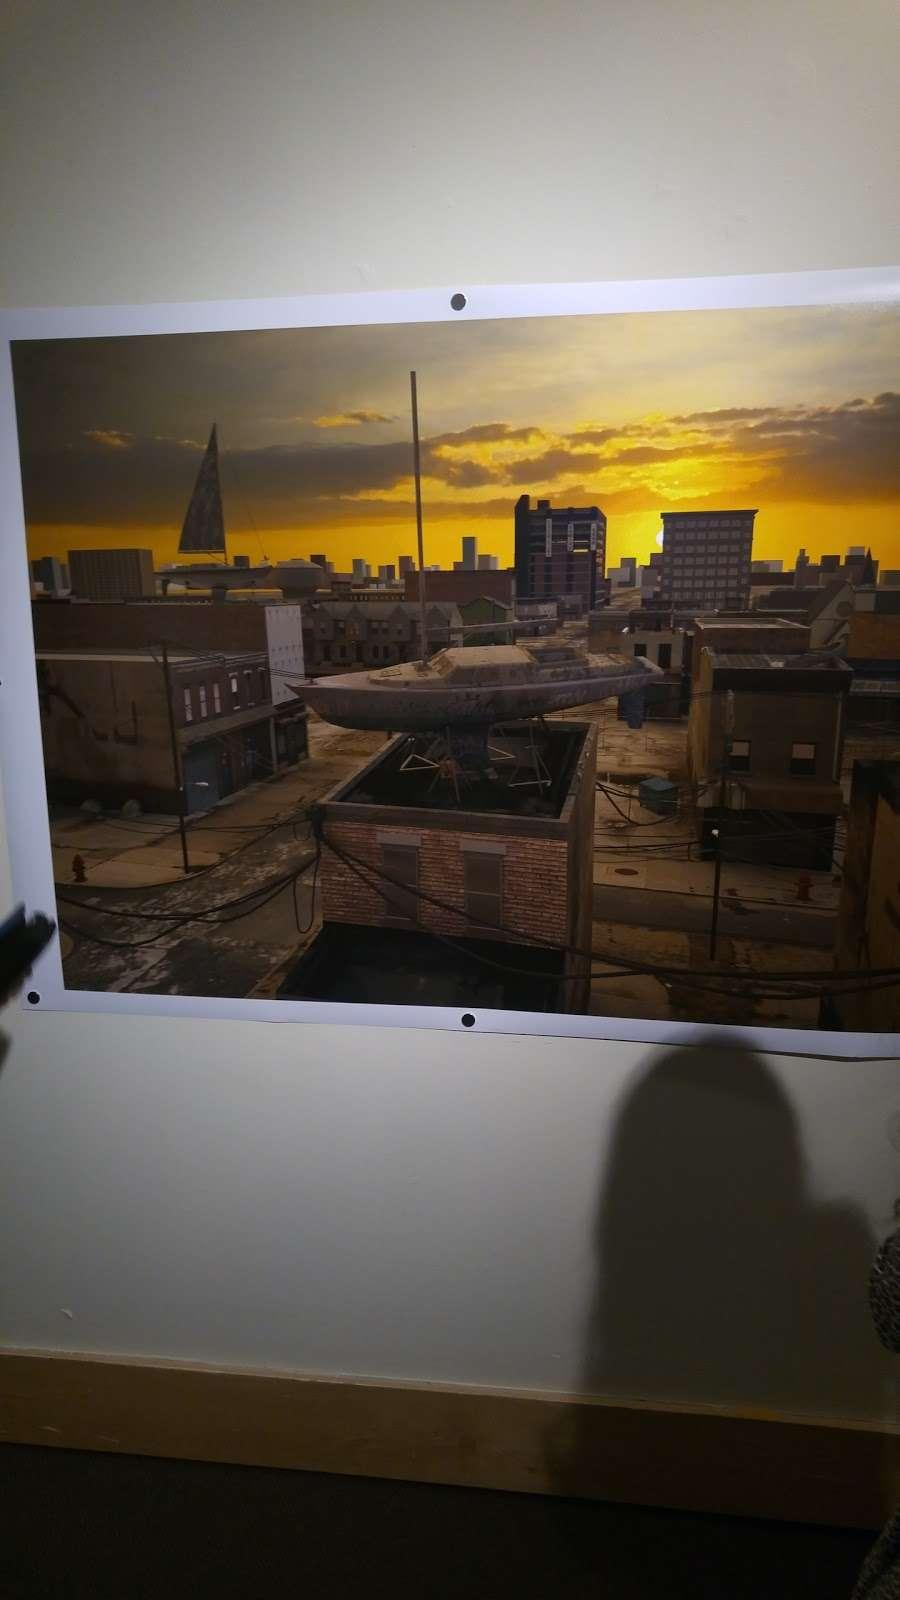 Stedman Gallery - art gallery    Photo 8 of 10   Address: N 3rd St & Pearl, Camden, NJ 08102, USA   Phone: (856) 225-6350